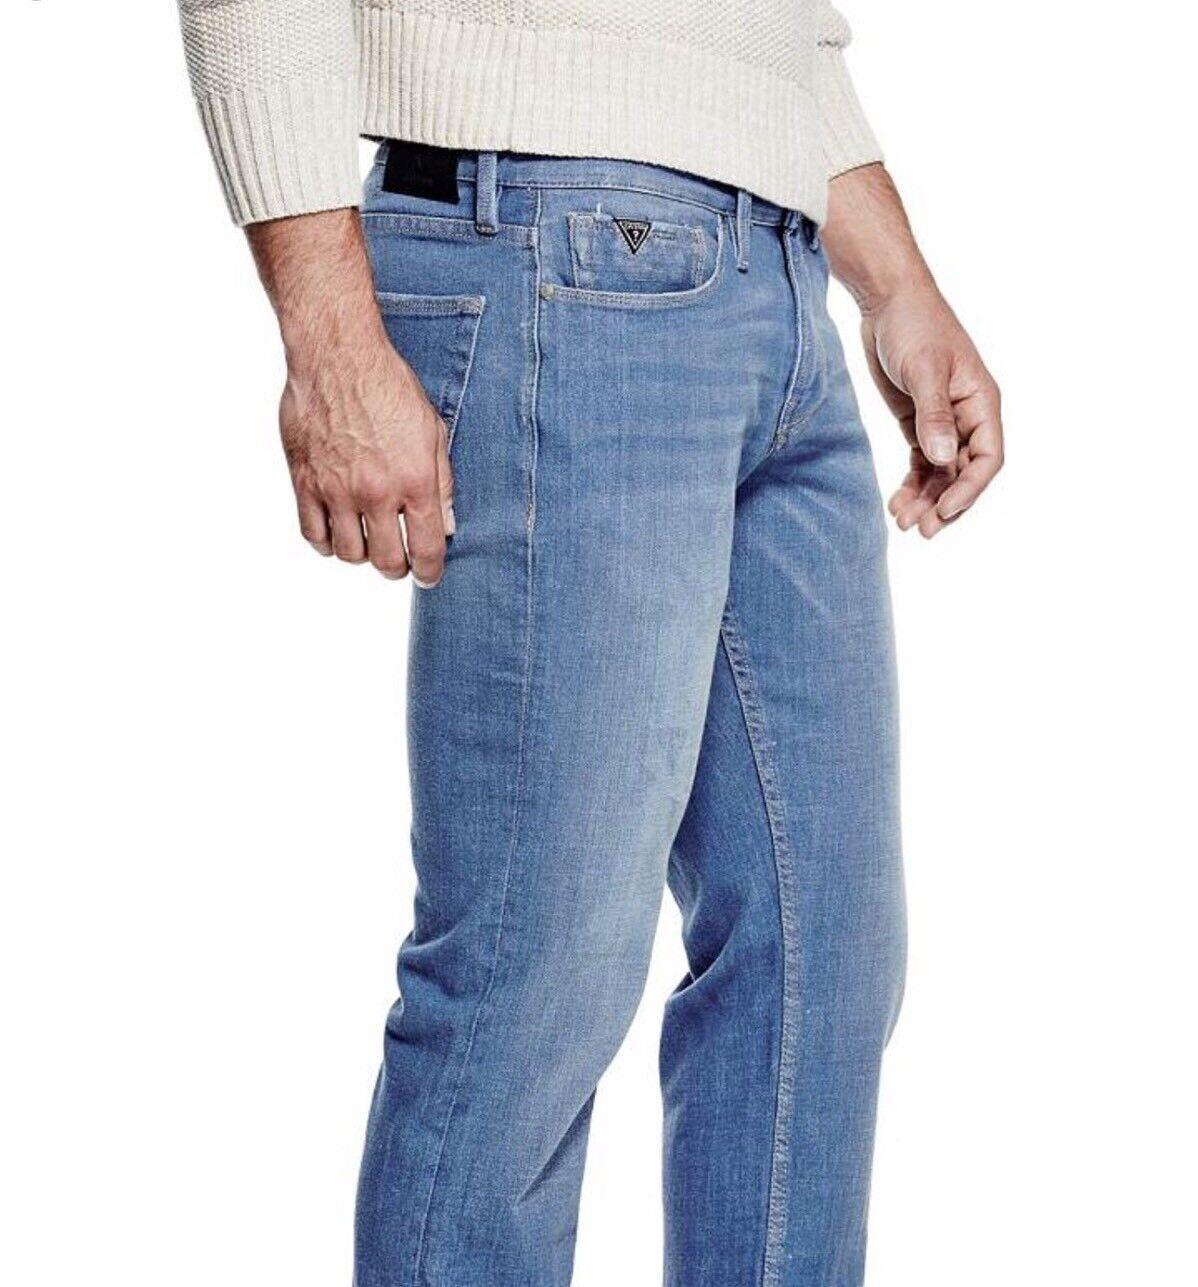 Guess Men's Slim Straight Jeans Max Stretch Super Comfort Denim In bluee 29